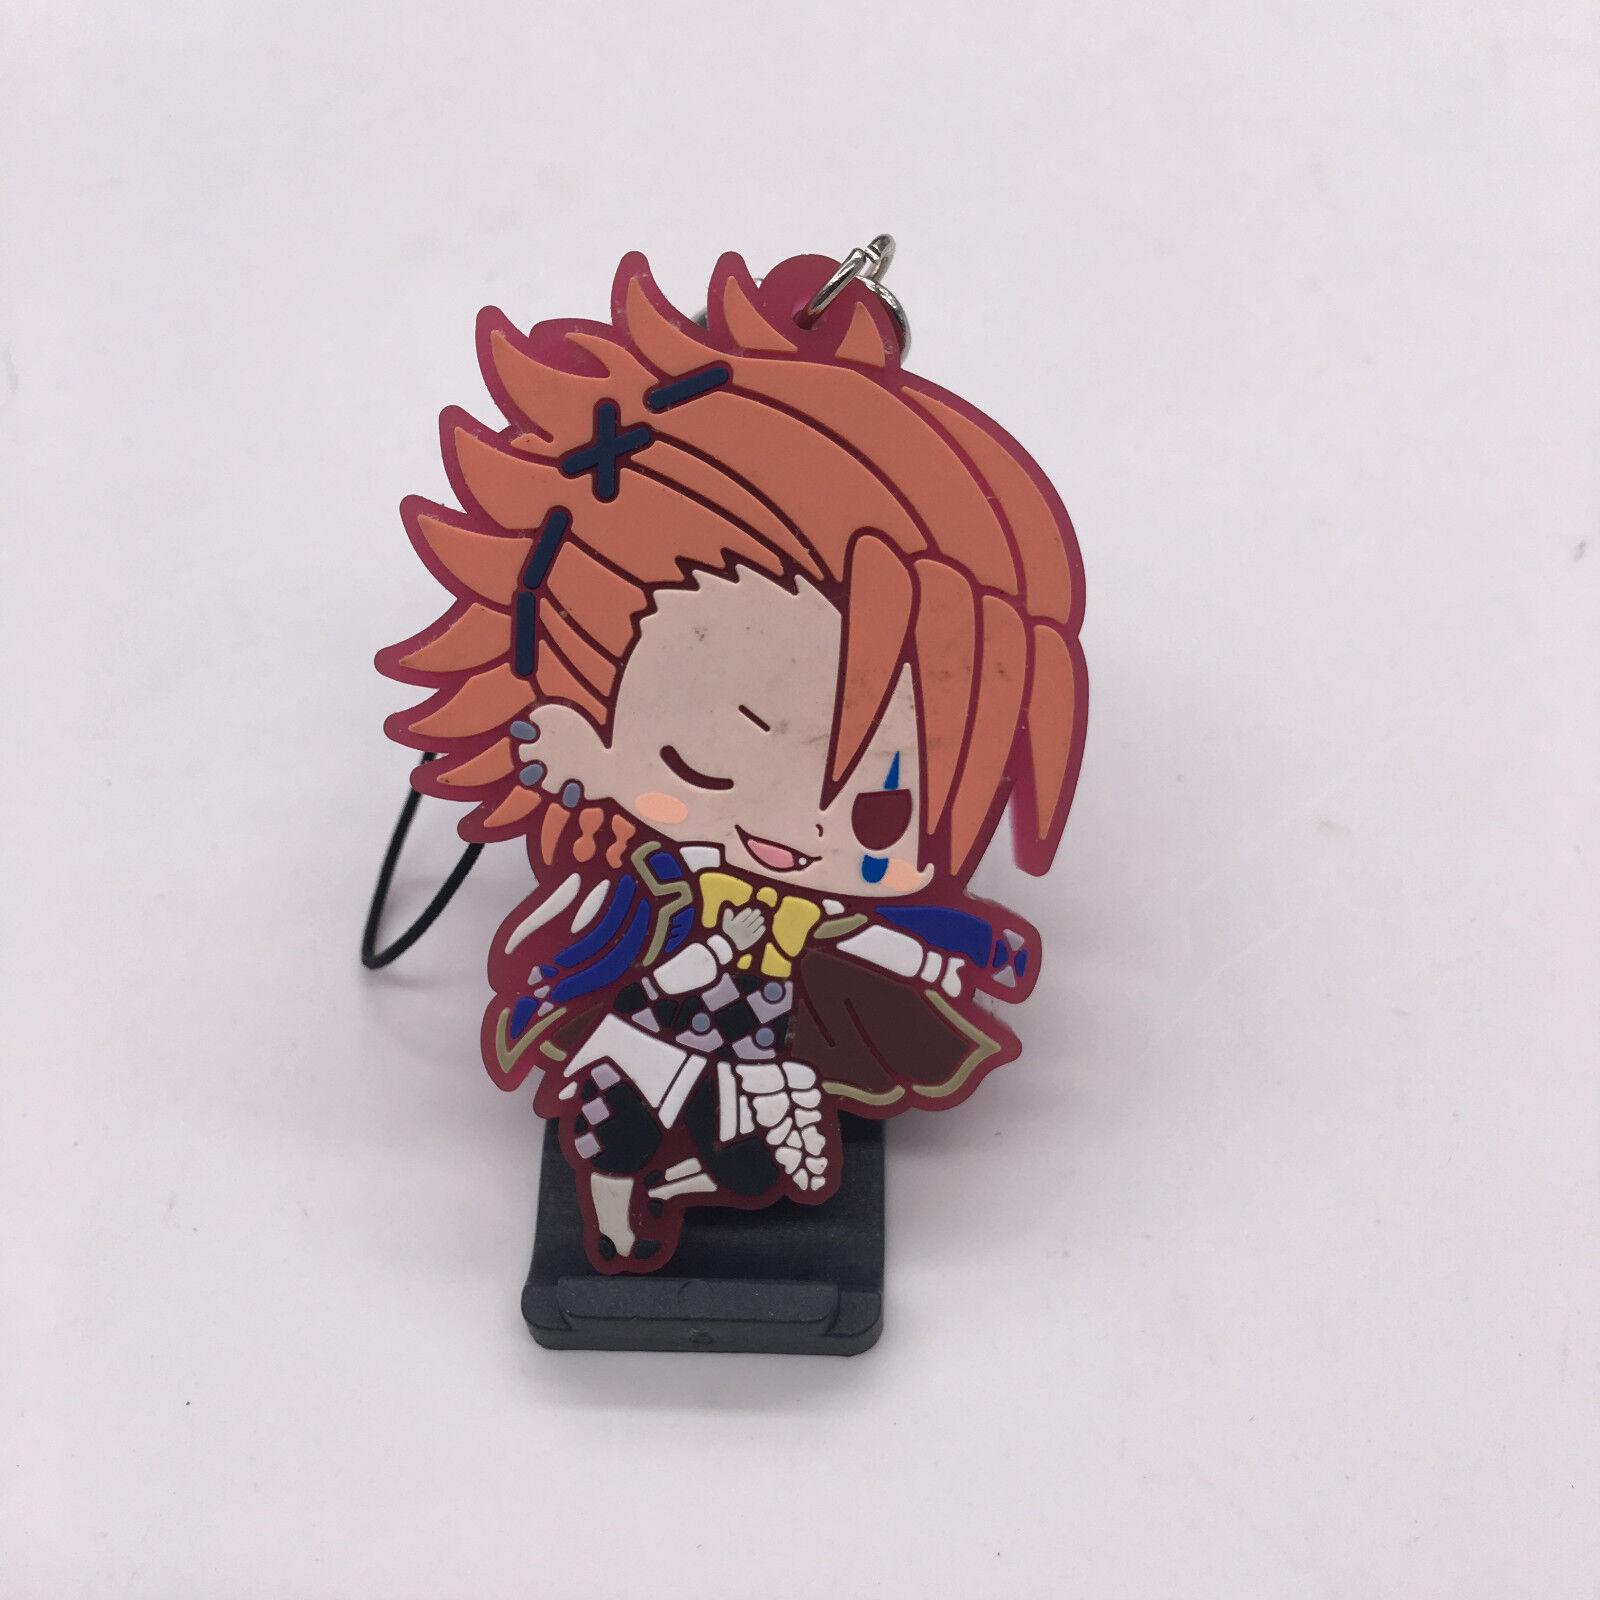 T417 10pcs//set Anime Black Butler Rubber Keychain Key Ring Schlüsselanhänger